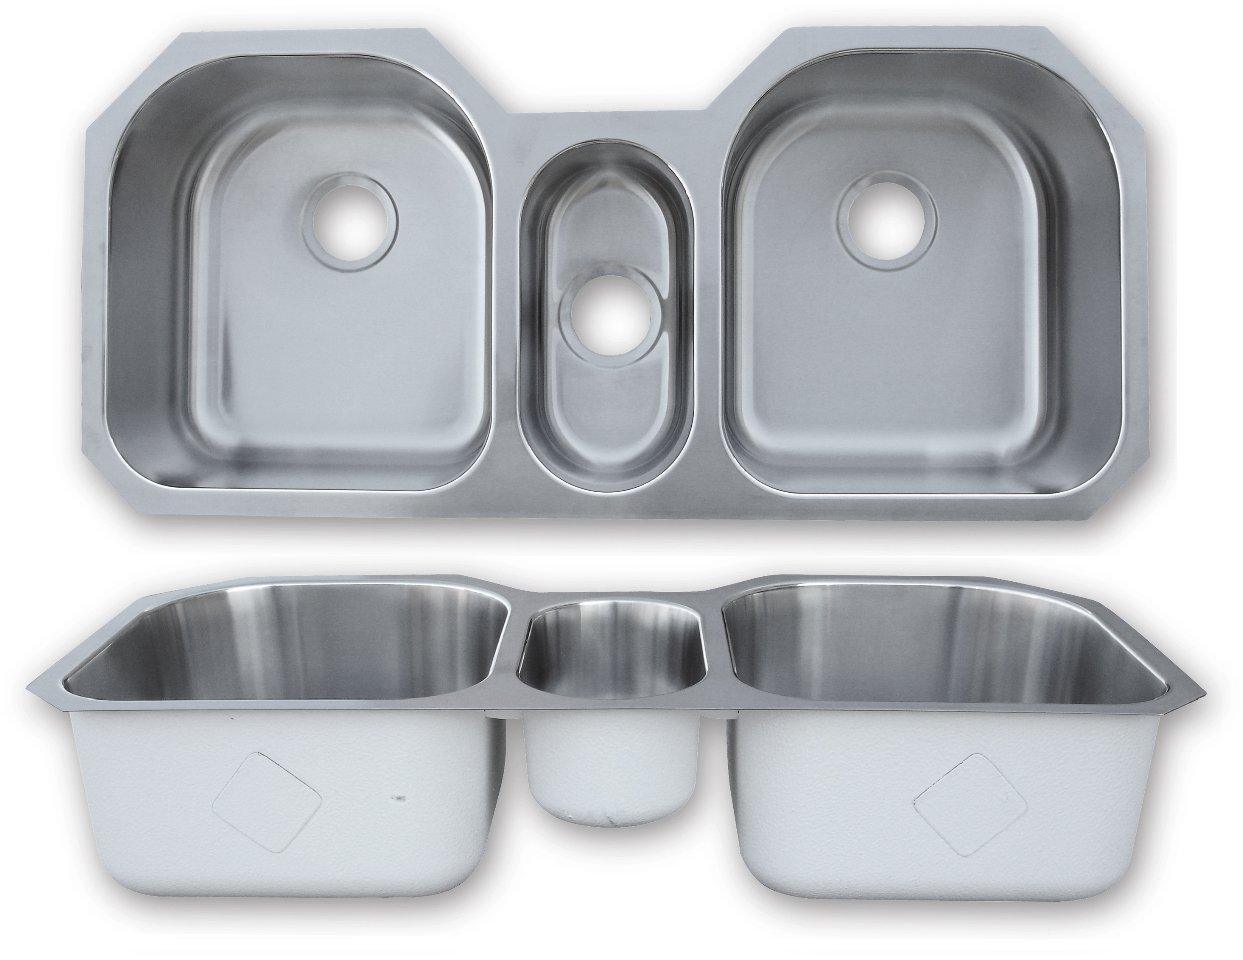 Amazon.com: 43 inch x 20 inch 16 Gauge Undermount Triple Stainless on 6 inch deep kitchen sink, stainless steel kitchen sinks, 7 inch kitchen sinks, 6 inch depth cabinets, undermount kitchen sinks,